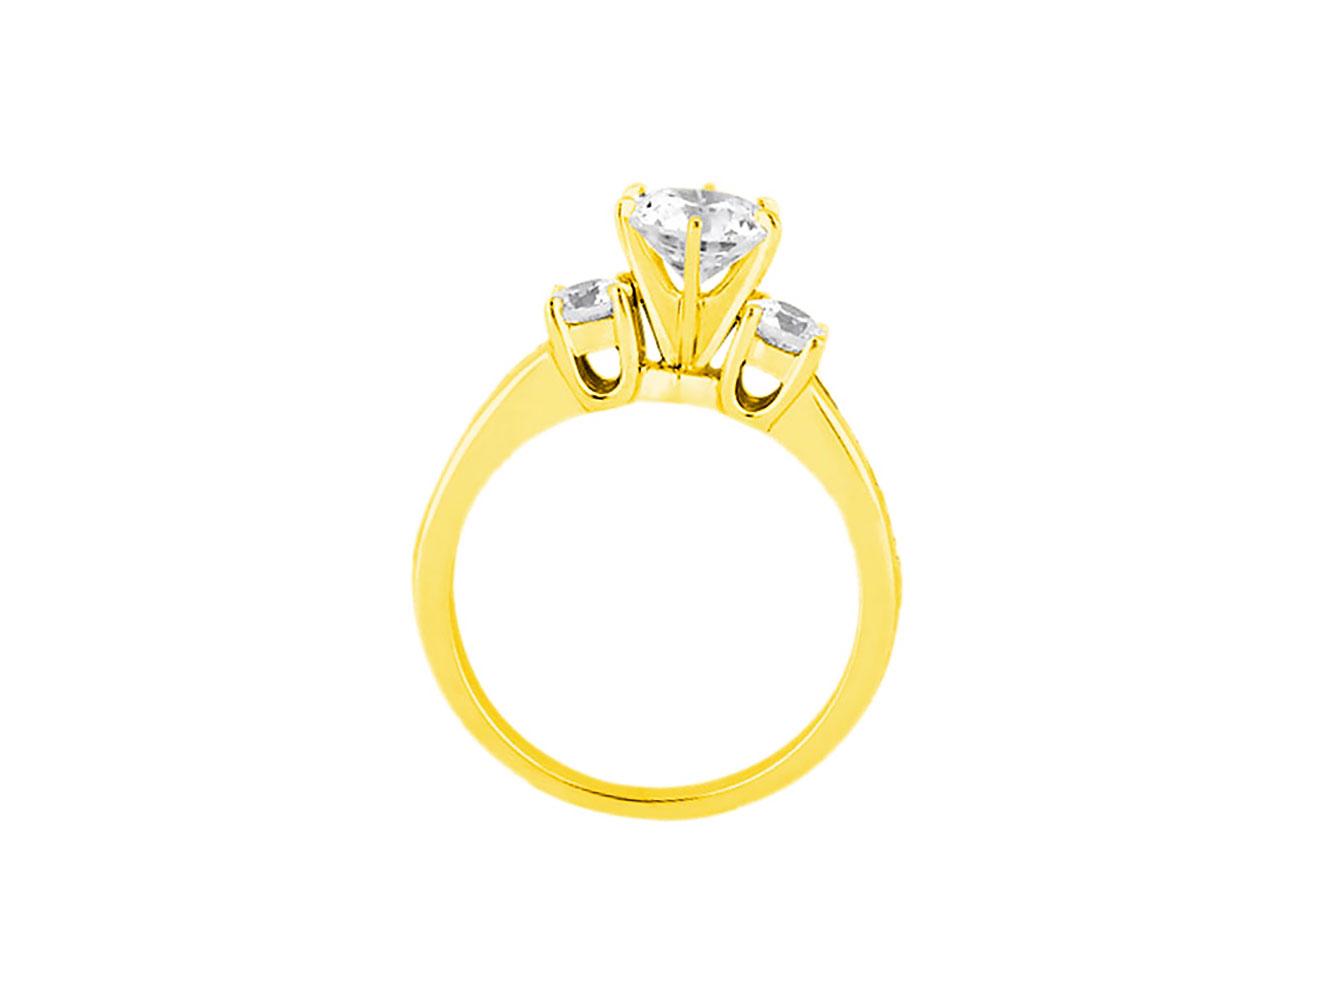 1-10-Quilates-Redondo-Princesa-Anillo-de-Compromiso-Diamante-Corte-10-Oro-Kl-I1 miniatura 12